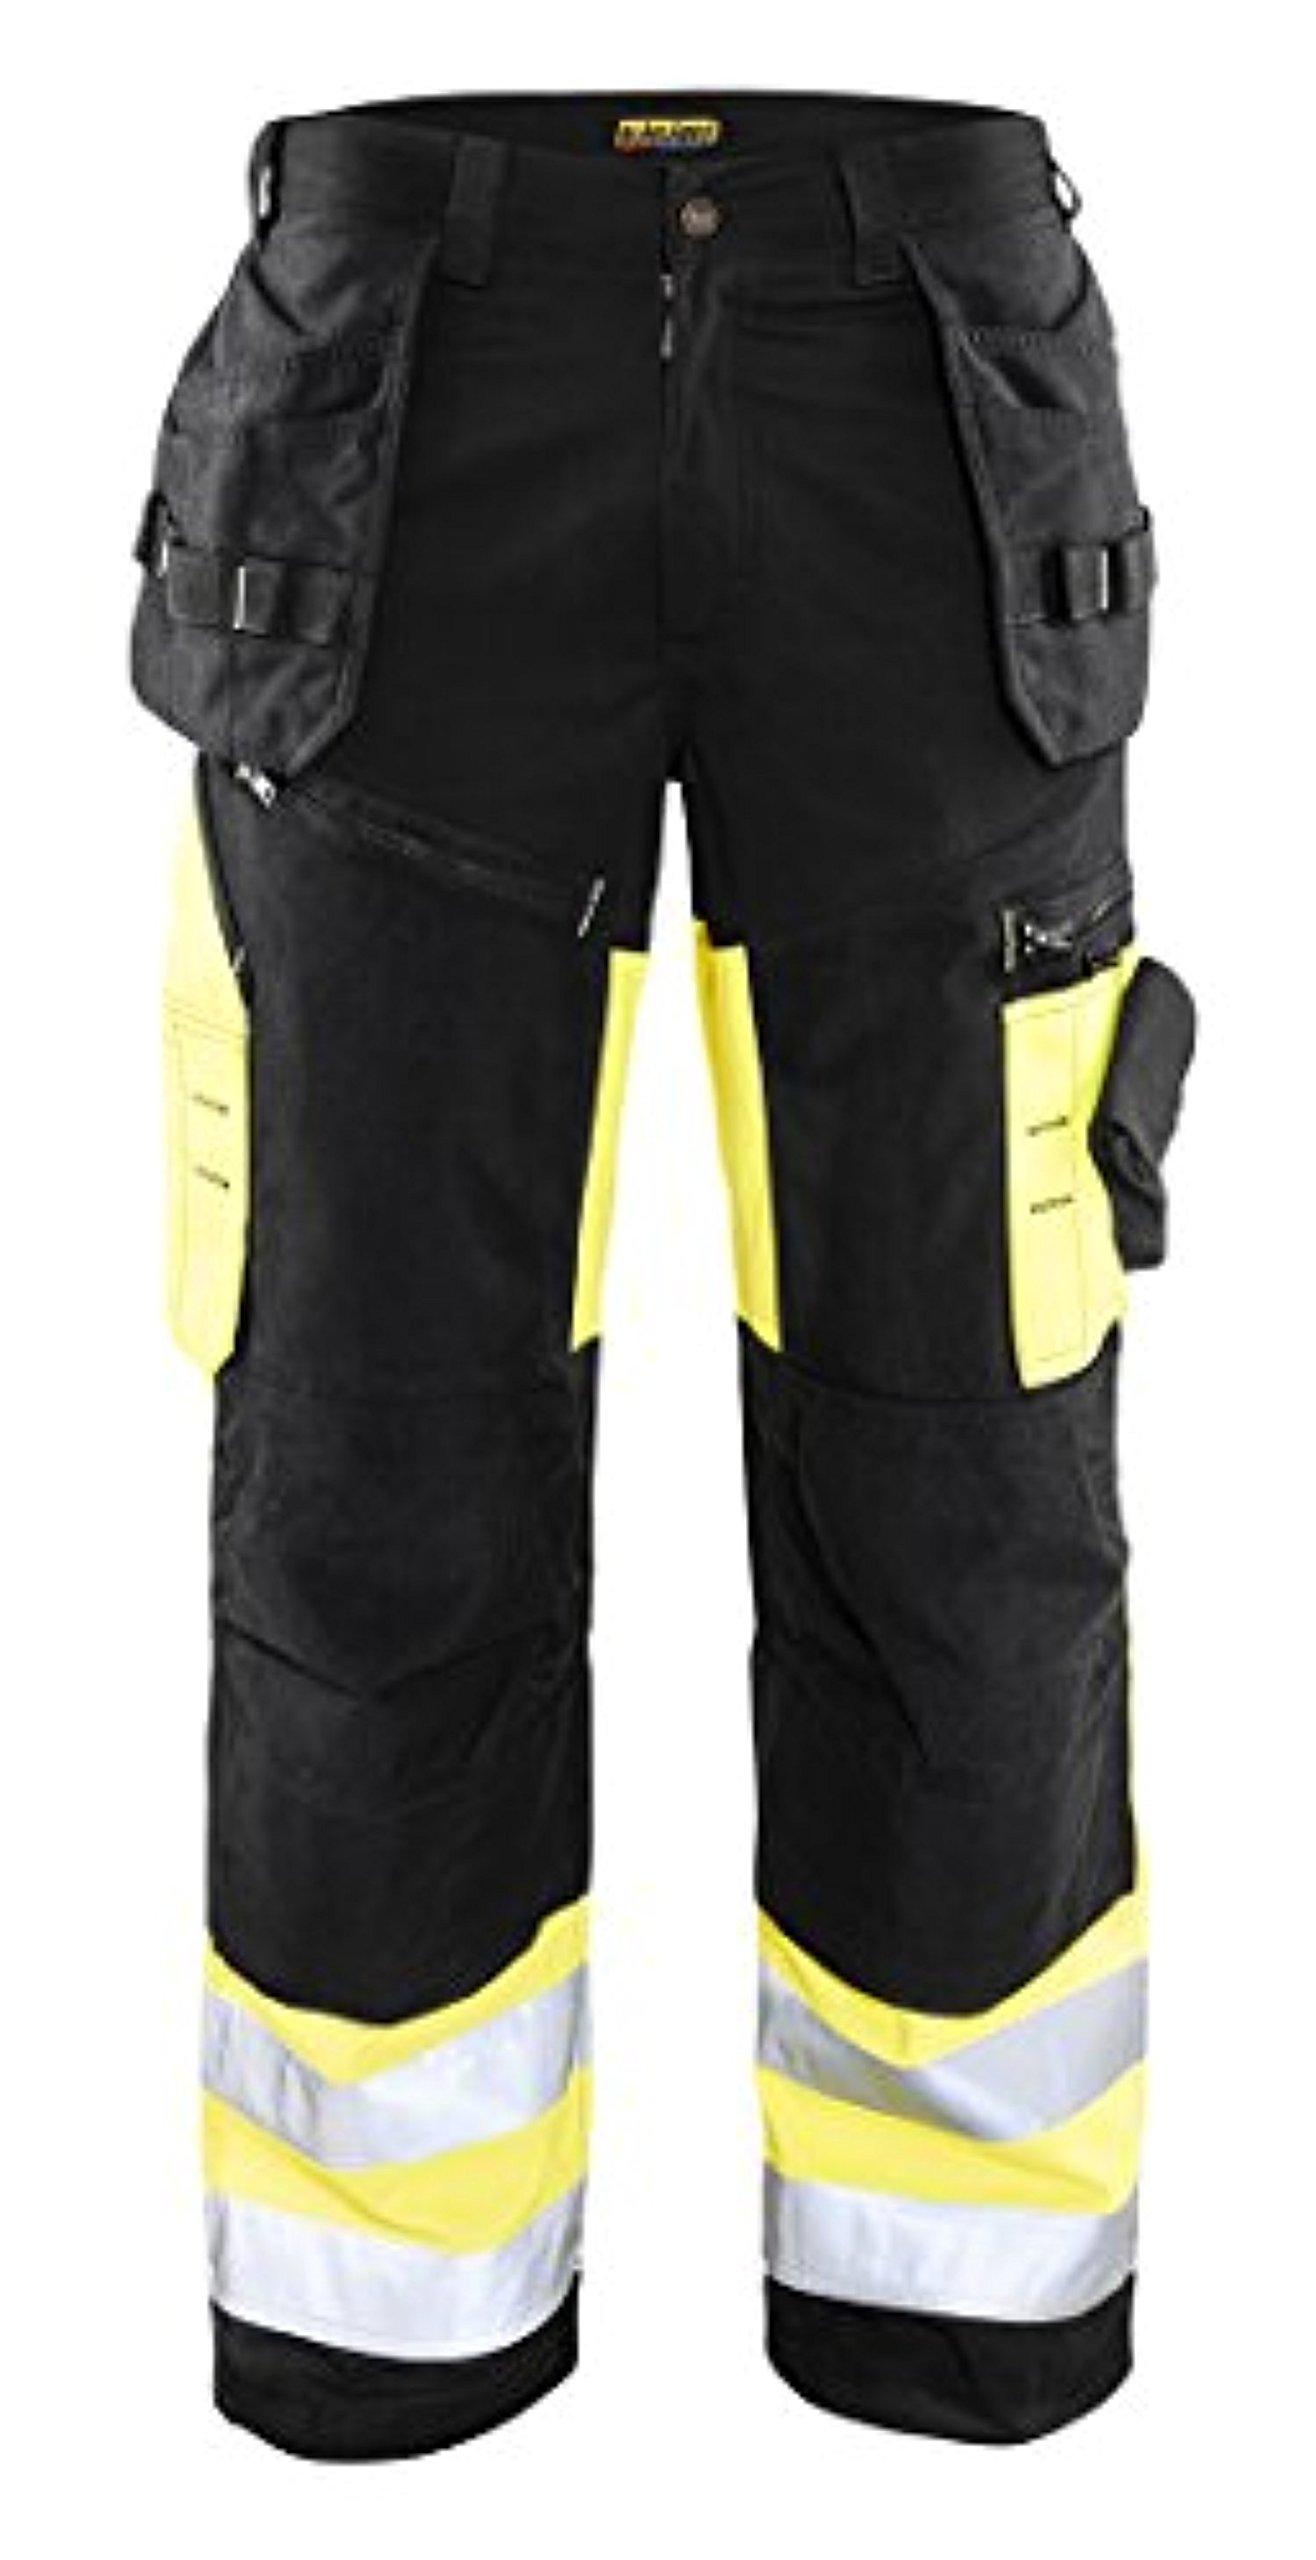 Blaklader X1600 HighVis Trouser Black/Yellow 32 32 & Work Bandana Bundle